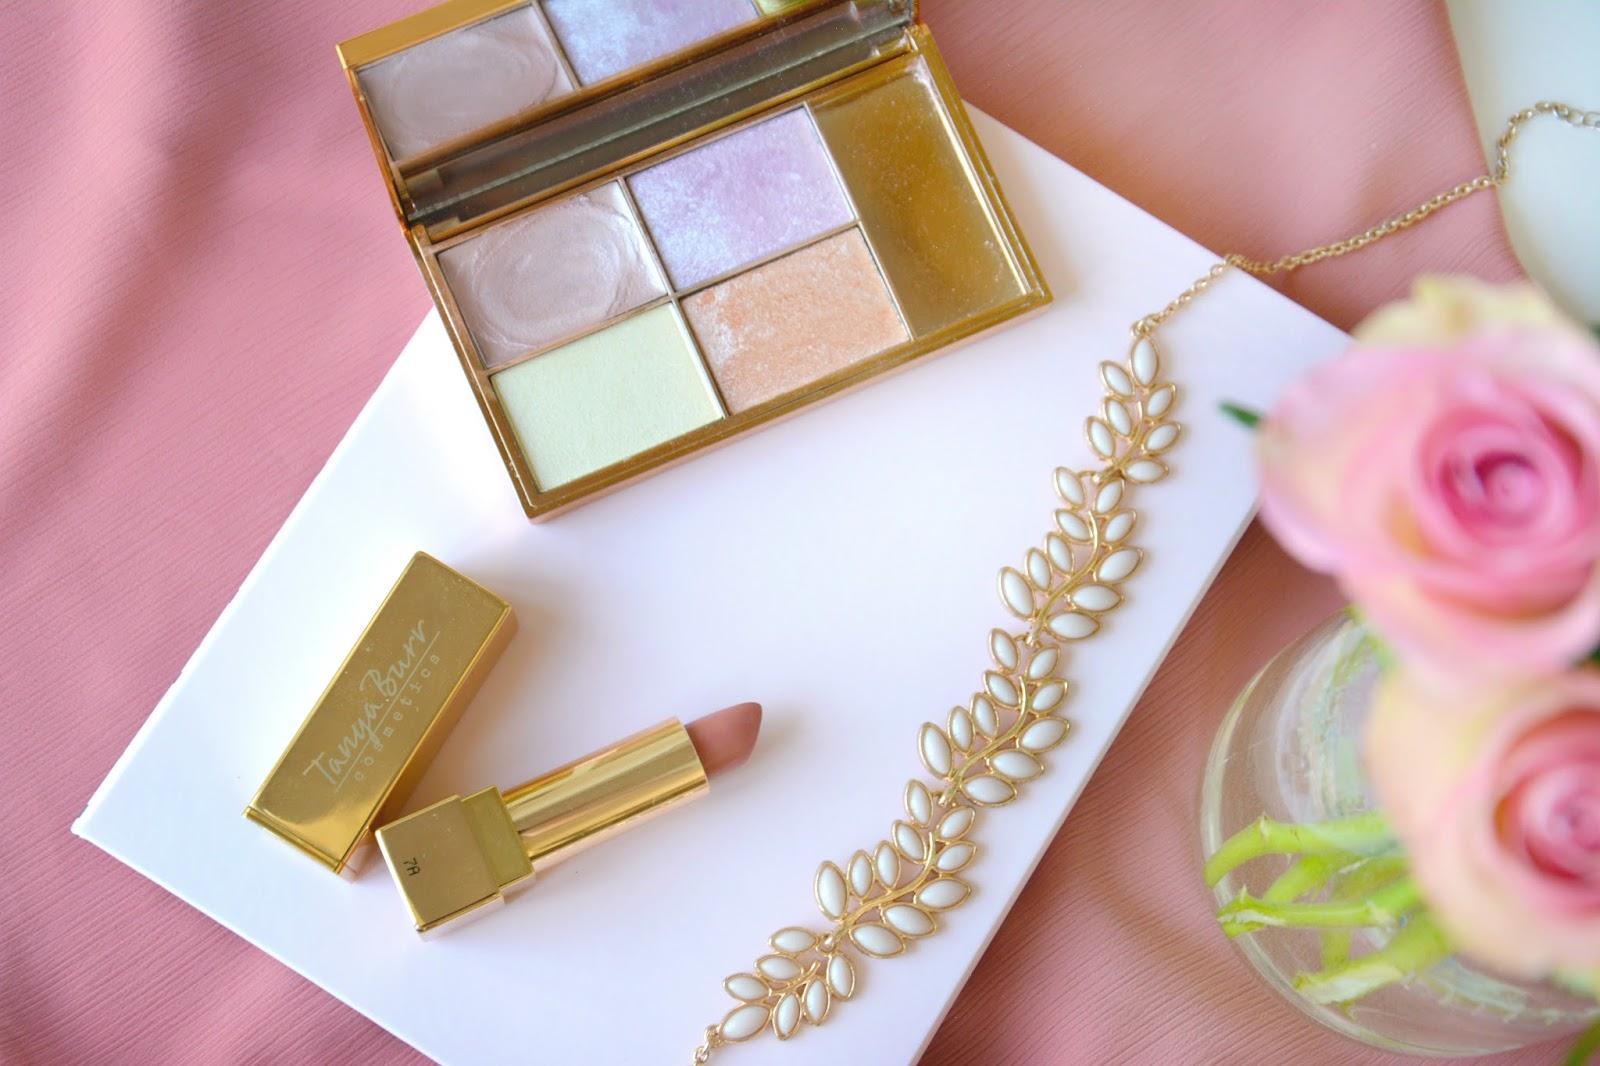 Tanya Burr Lipstick Pink Cocoa; Primark Necklace; Fresh Pink Roses; Sleek Solstice Highlighting Palette